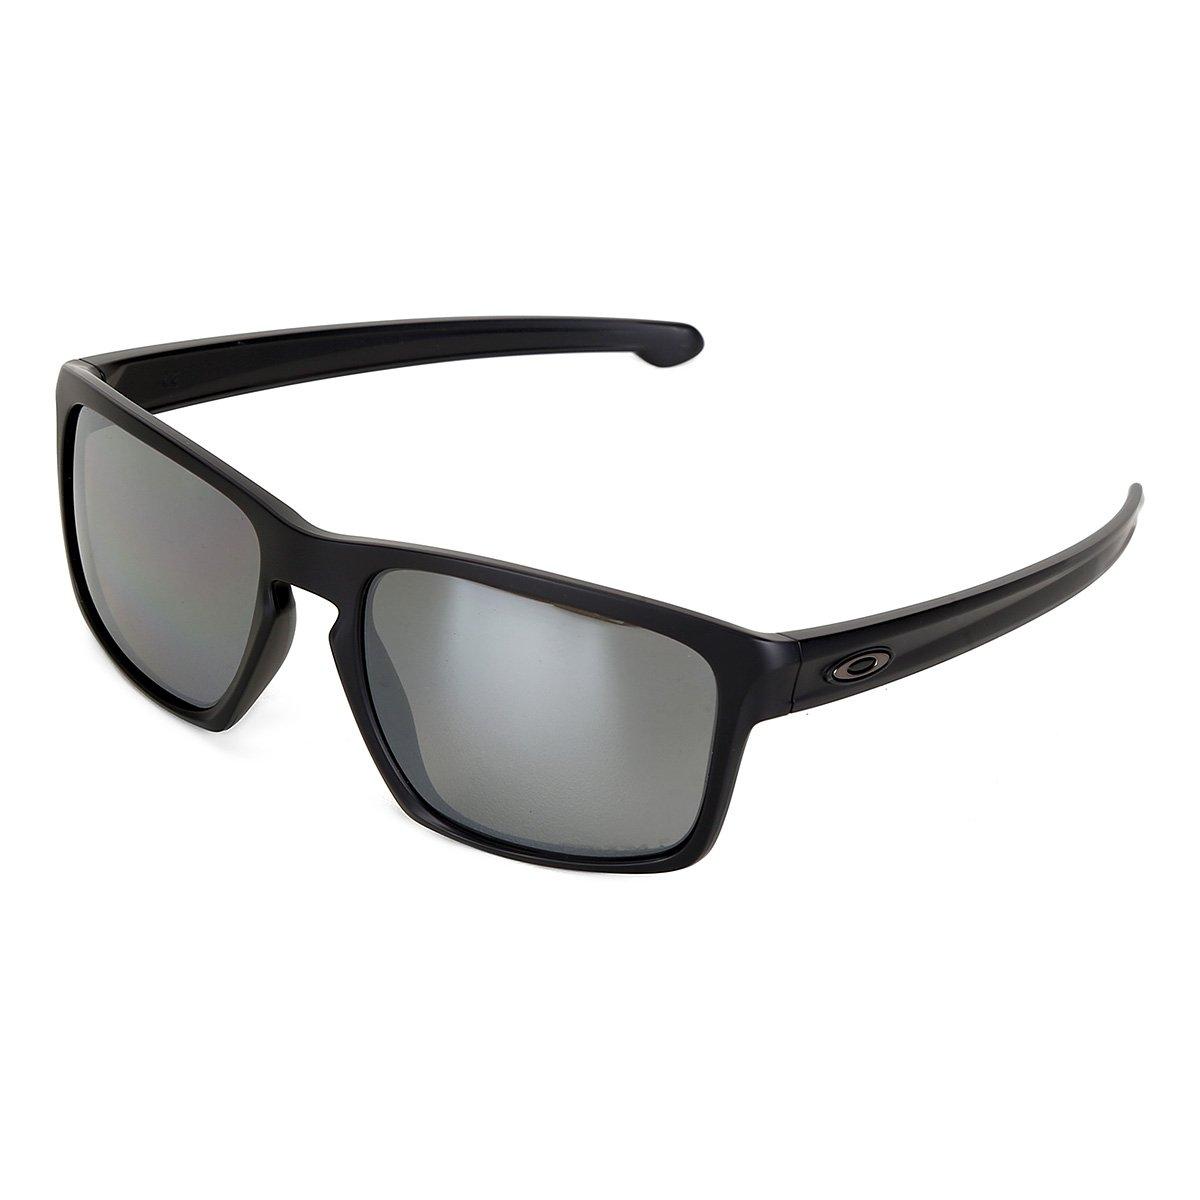 38e306aea Óculos de Sol Oakley Sliver Iridium Masculino   Netshoes